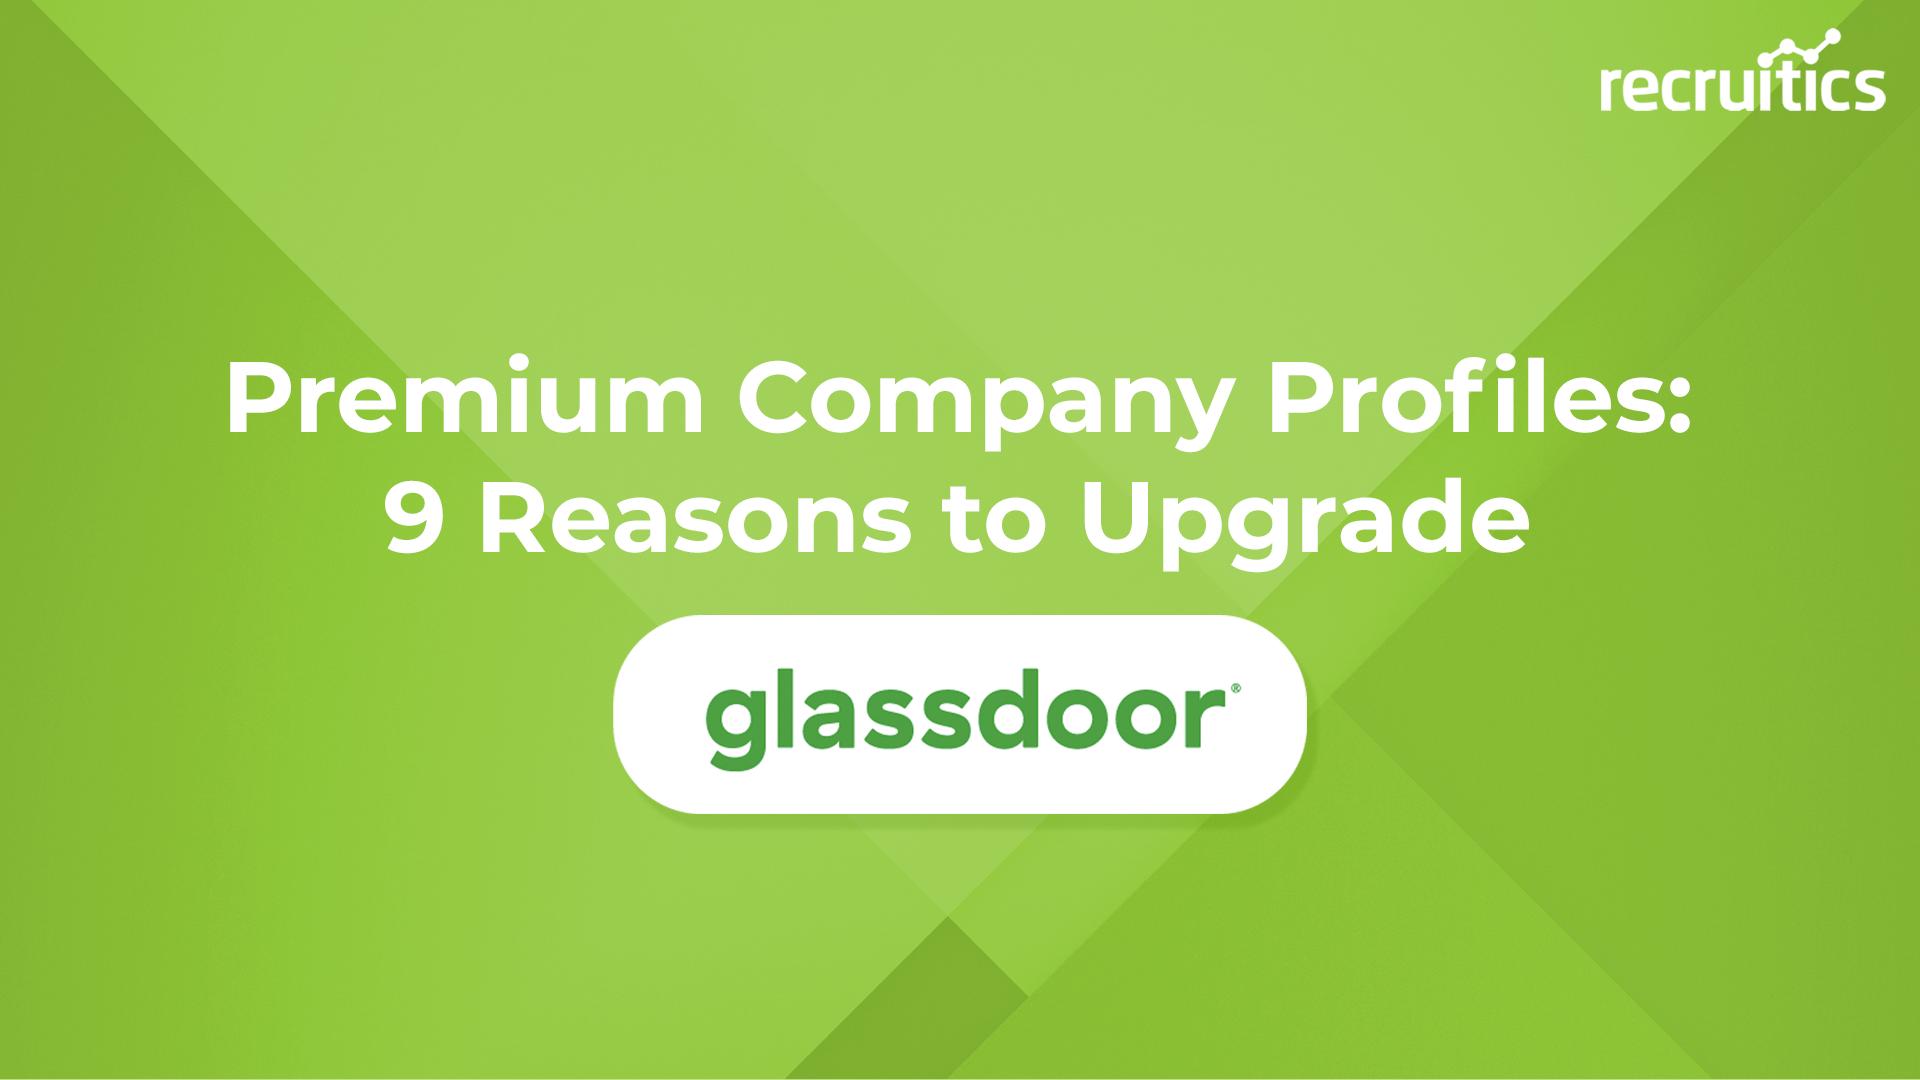 glassdoor enhanced profile recruitics